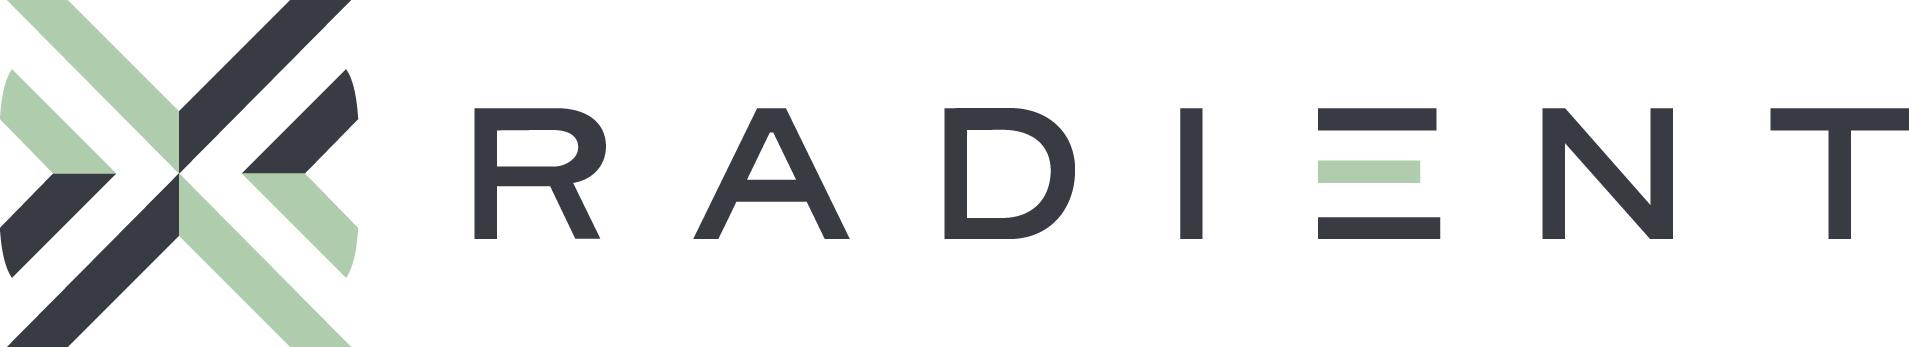 Radient Technologies Inc